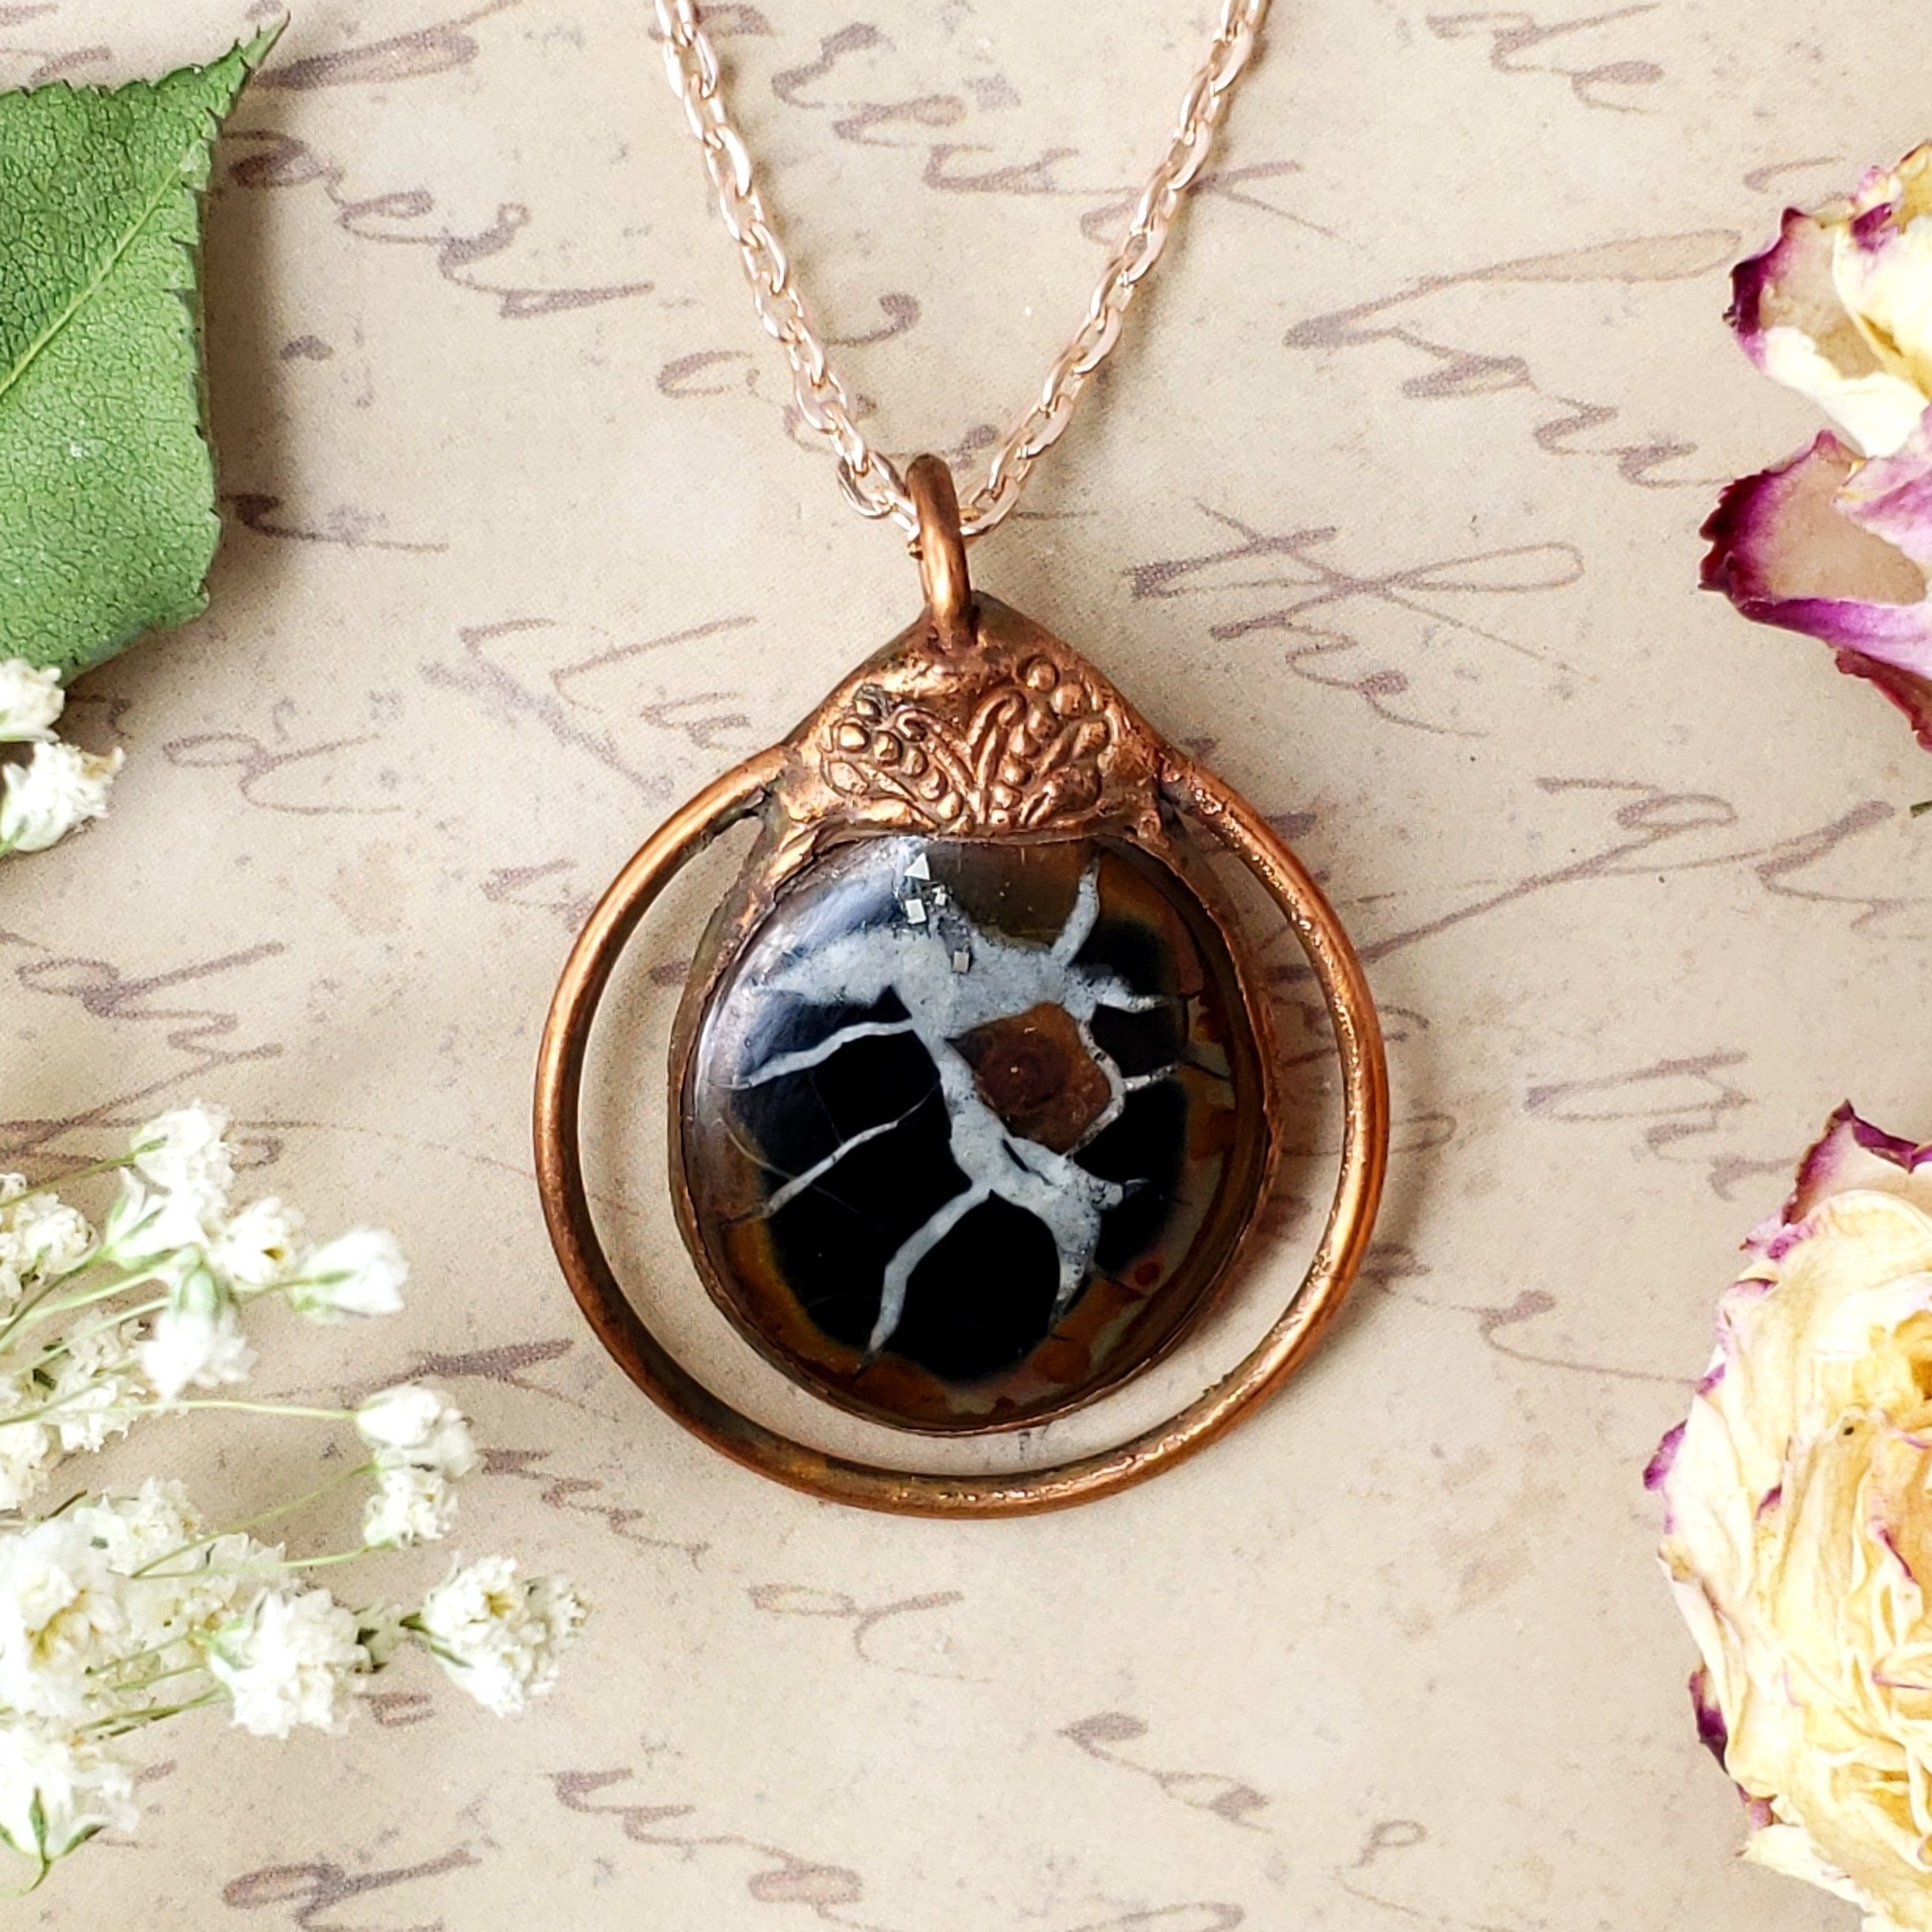 Gemstone Necklace Copper Electroformed Necklace Dragon and Labradorite Necklace Dragon Jewelry Fantasy Necklace Copper Necklace